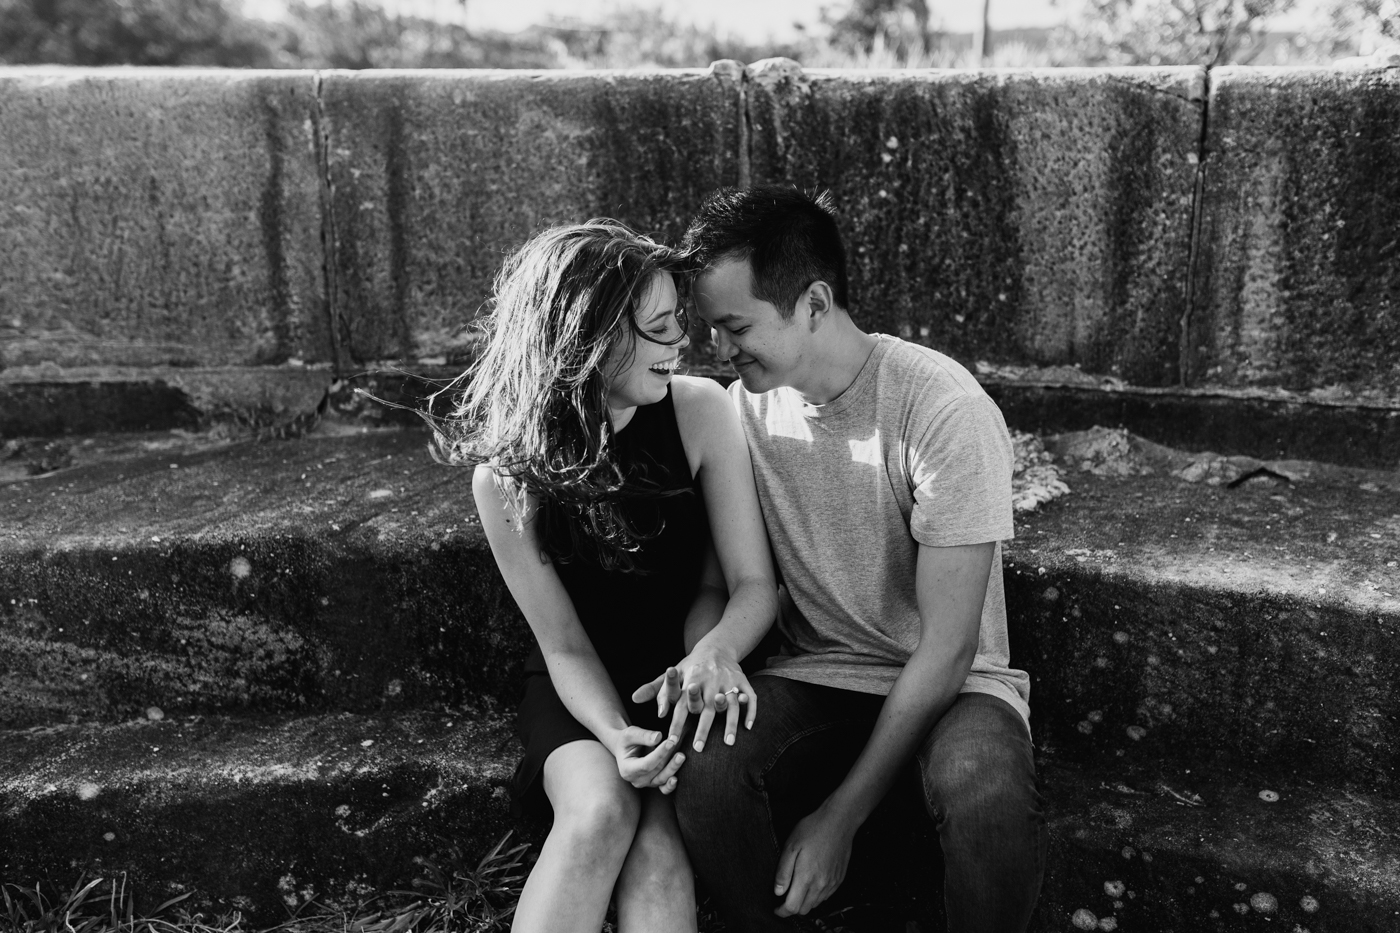 James & Caitie Engagement - Watsons Bay - Samantha Heather Photography-7.jpg